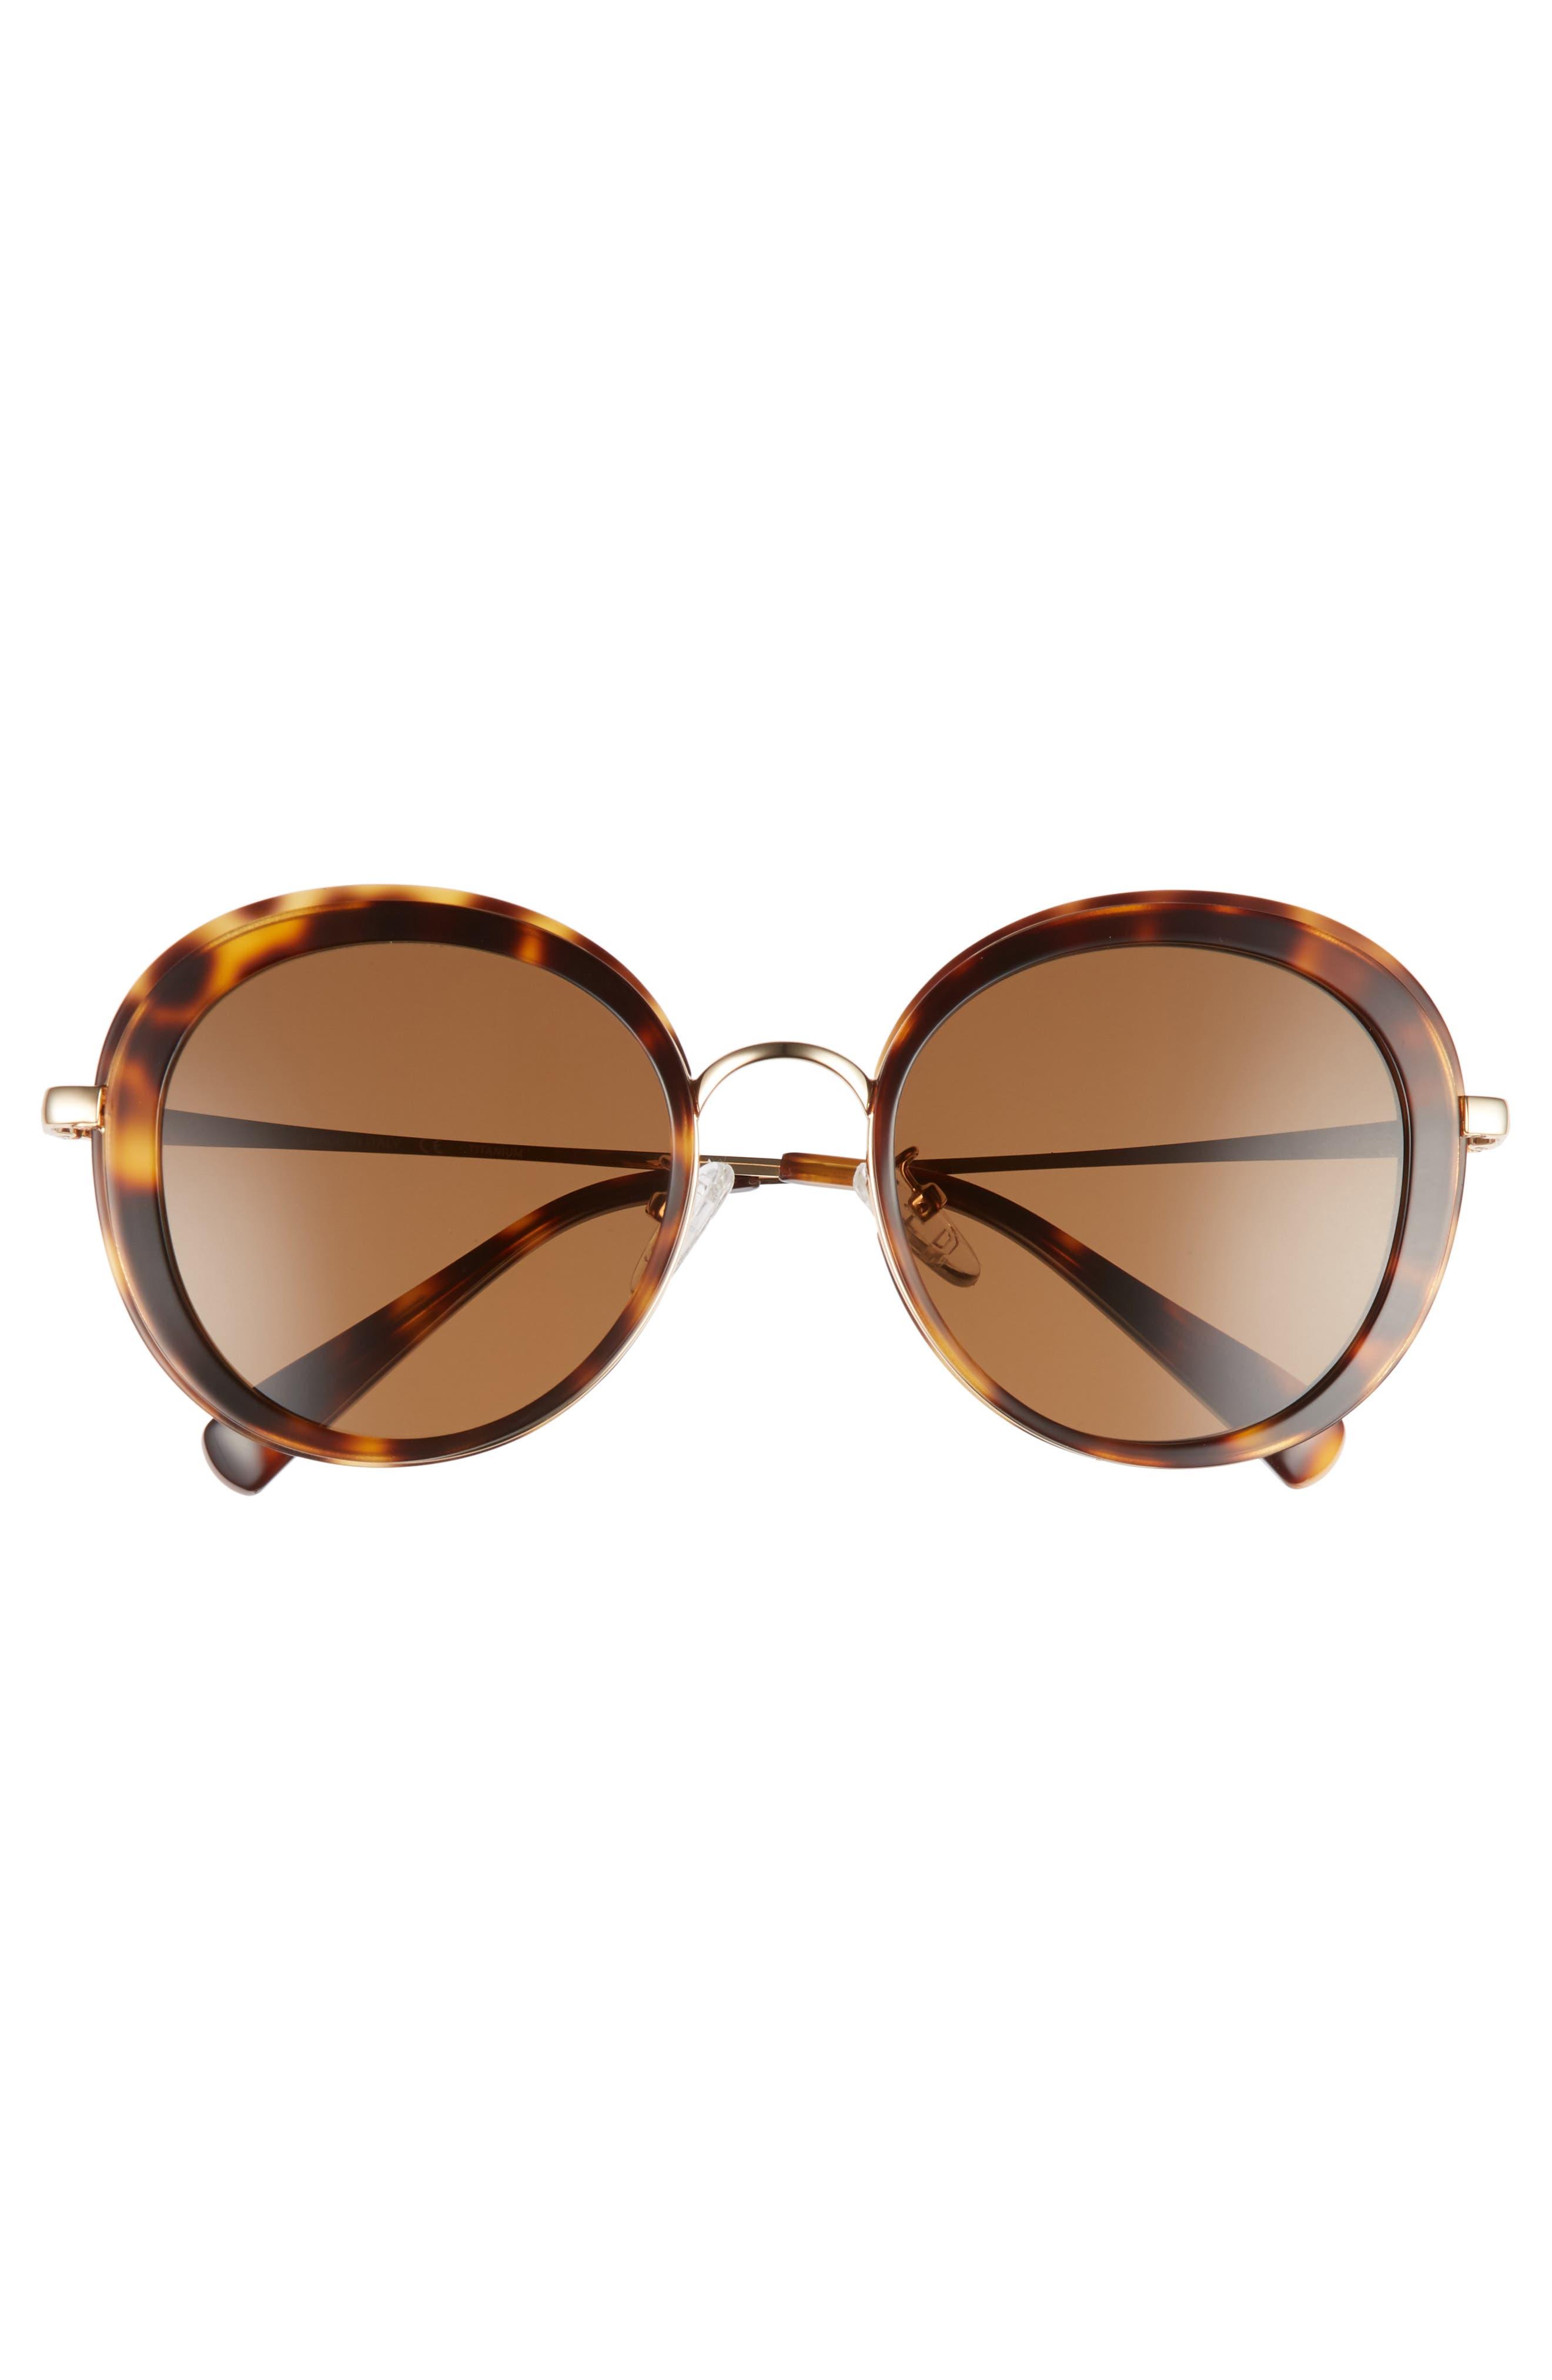 BLANC & ECLARE Portofino 54mm Polarized Sunglasses,                             Alternate thumbnail 3, color,                             Tortoise/ Gold/ Solid Brown